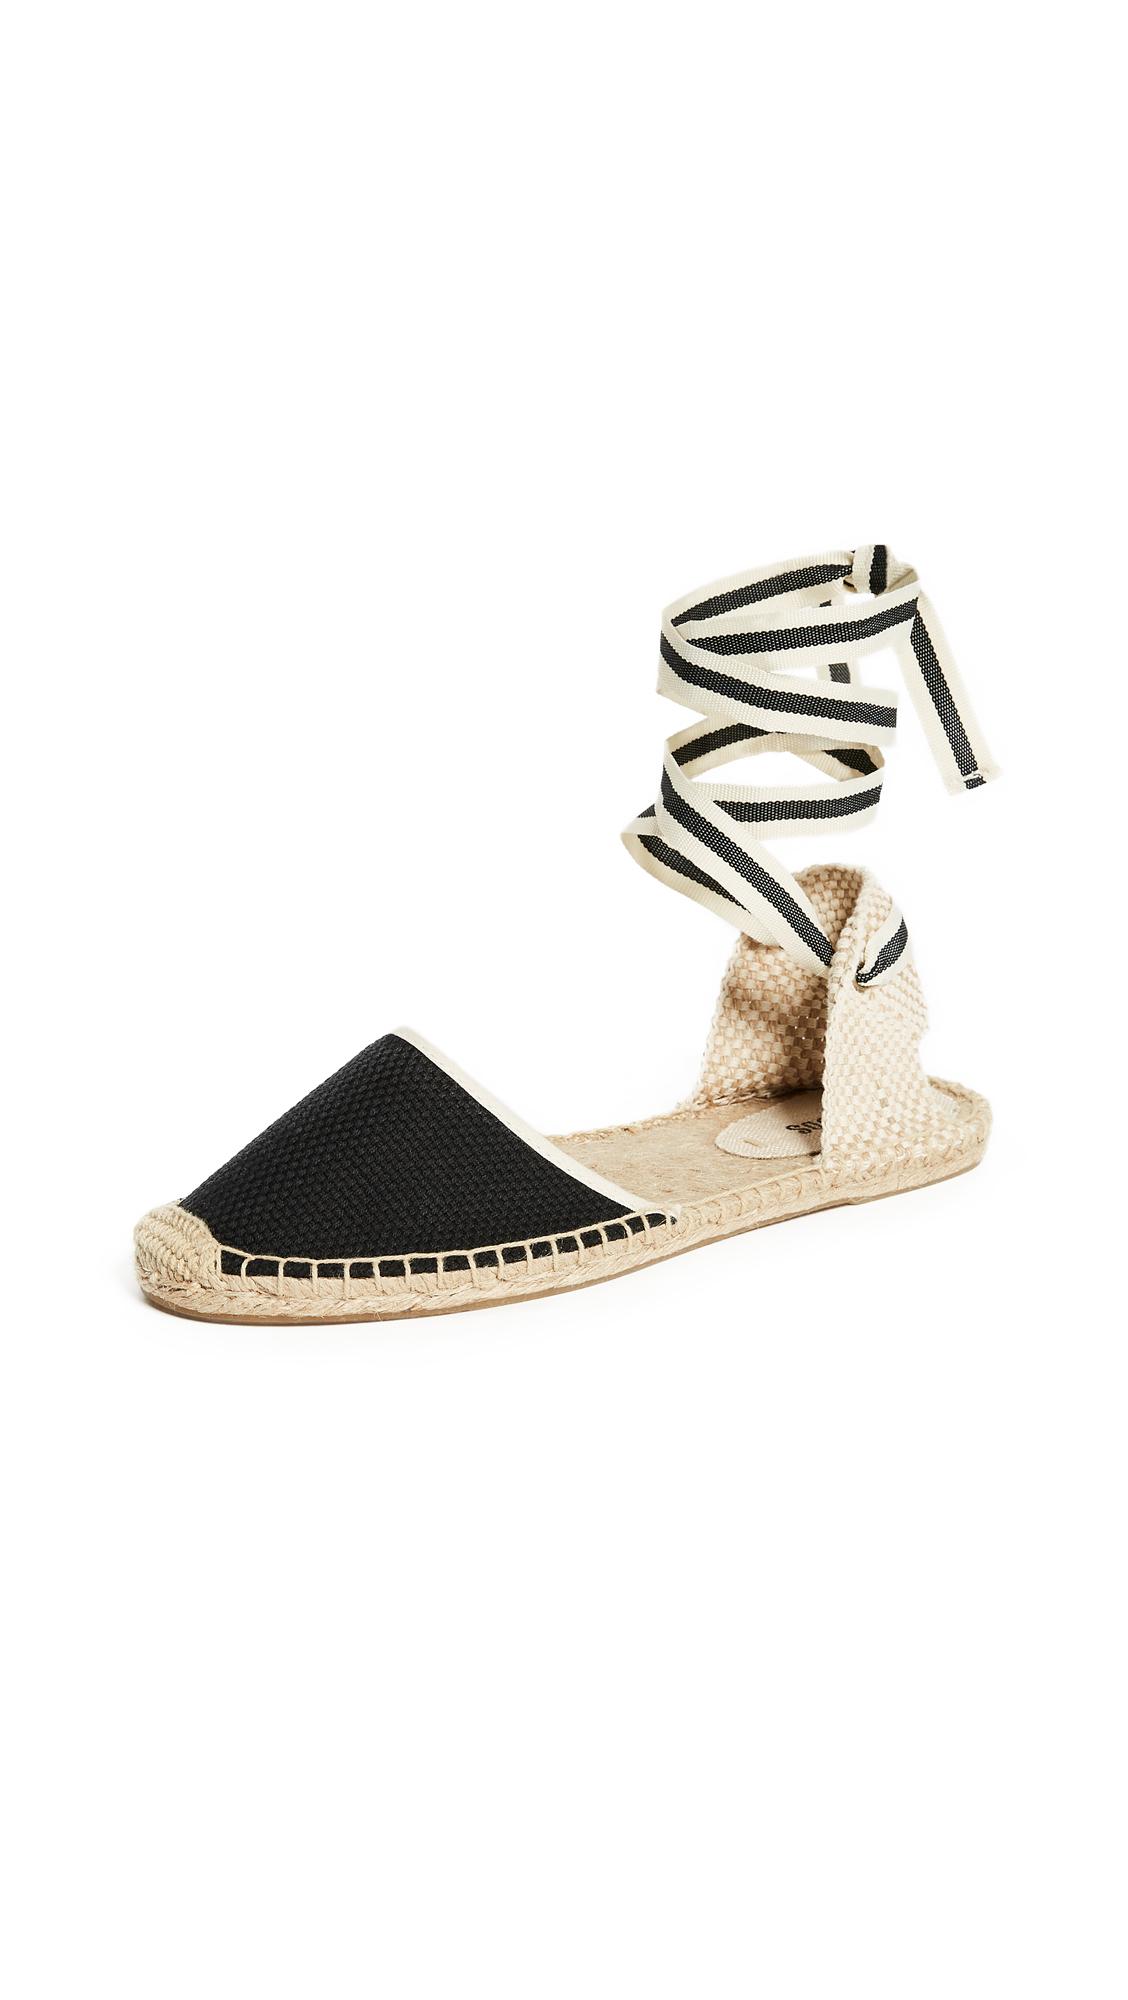 Soludos Espadrille Sandals - Black